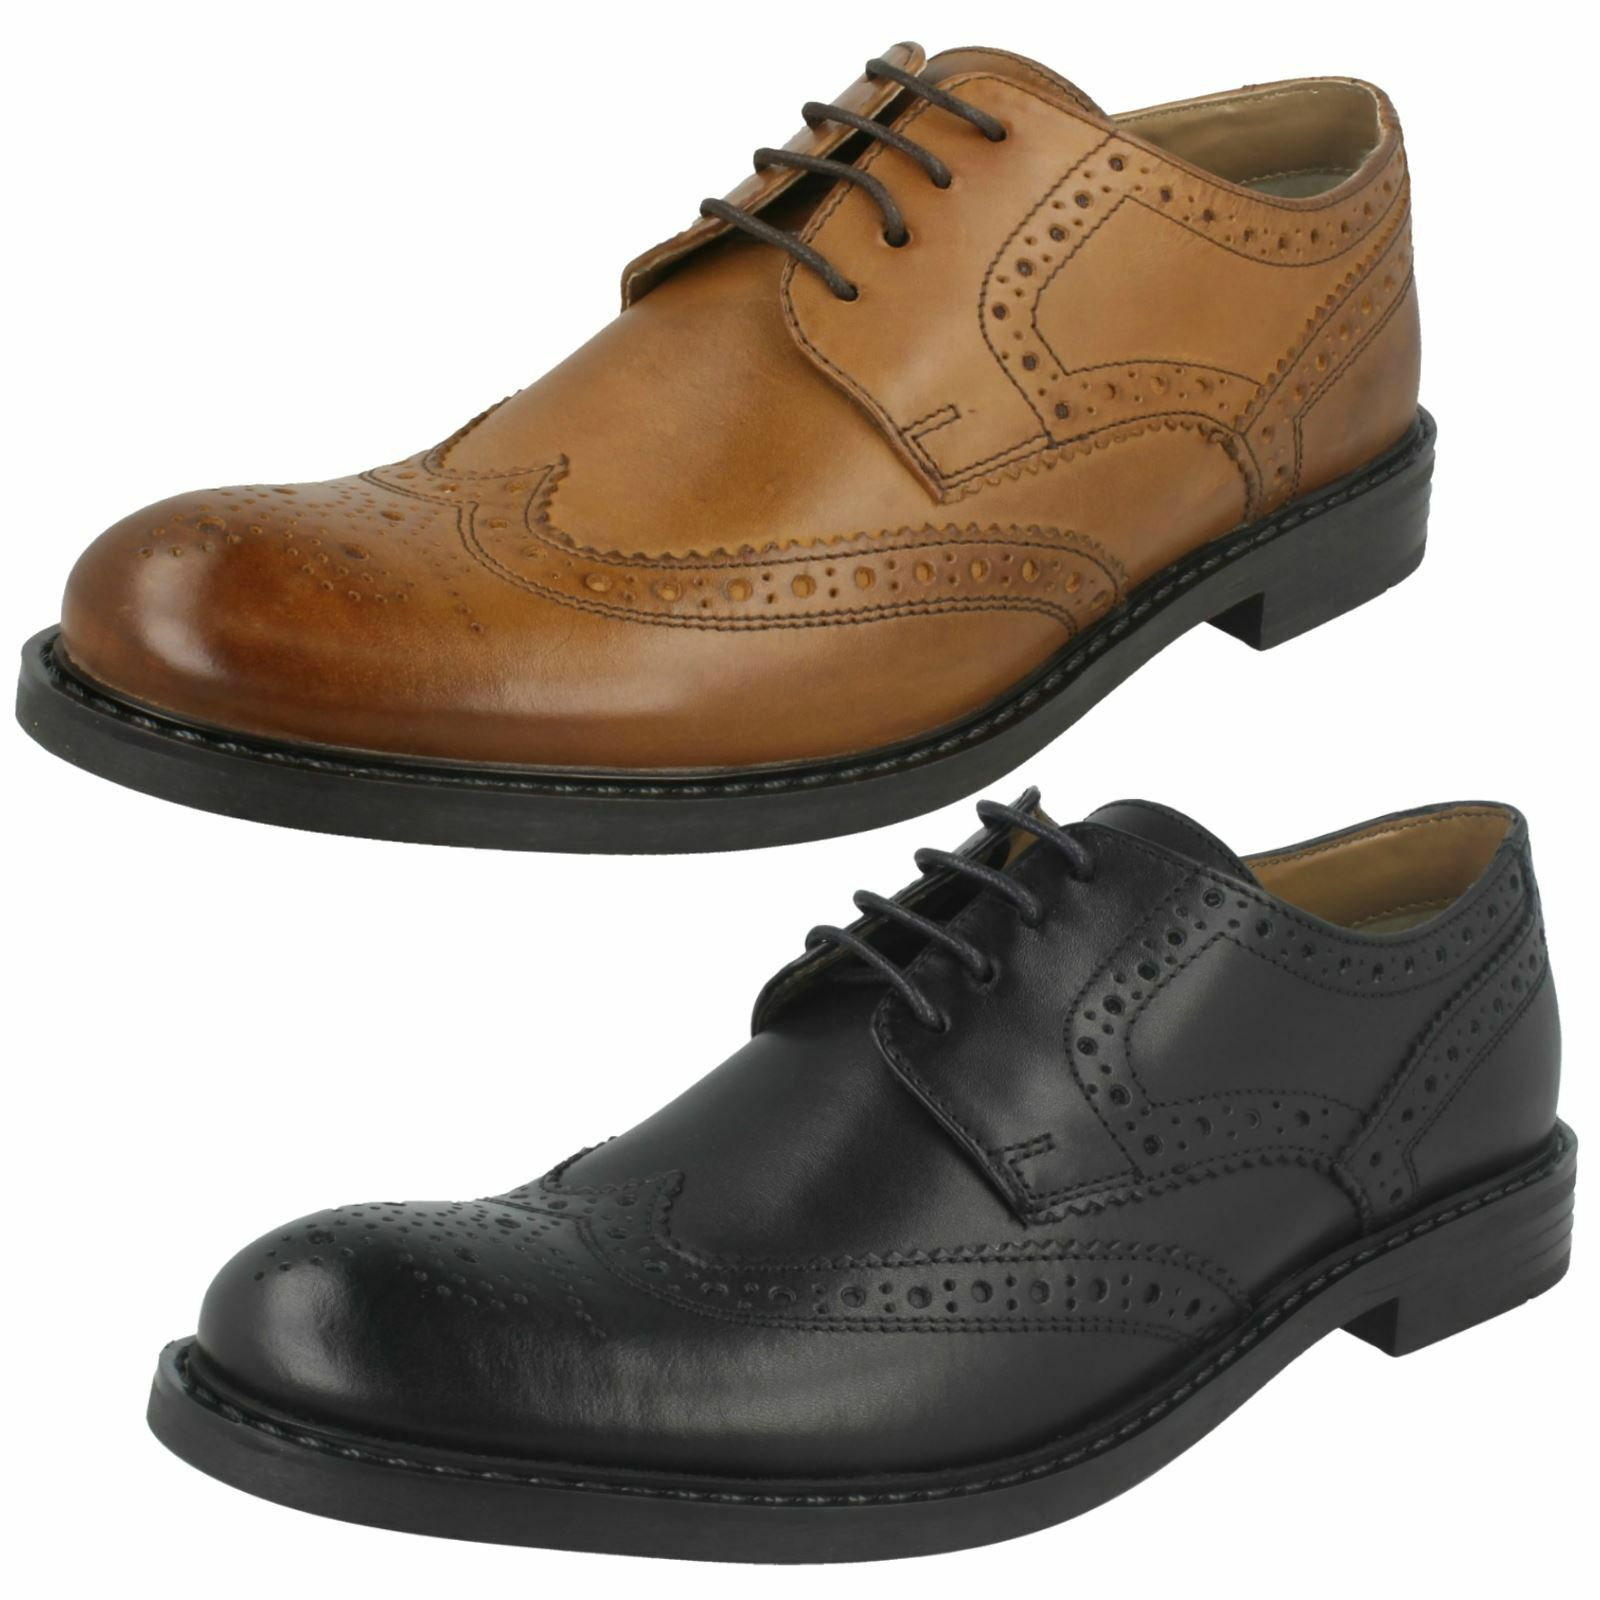 afe5d930726b5 Mens London Brogues Main Base - oaiitl3675-Formal Shoes - dance ...